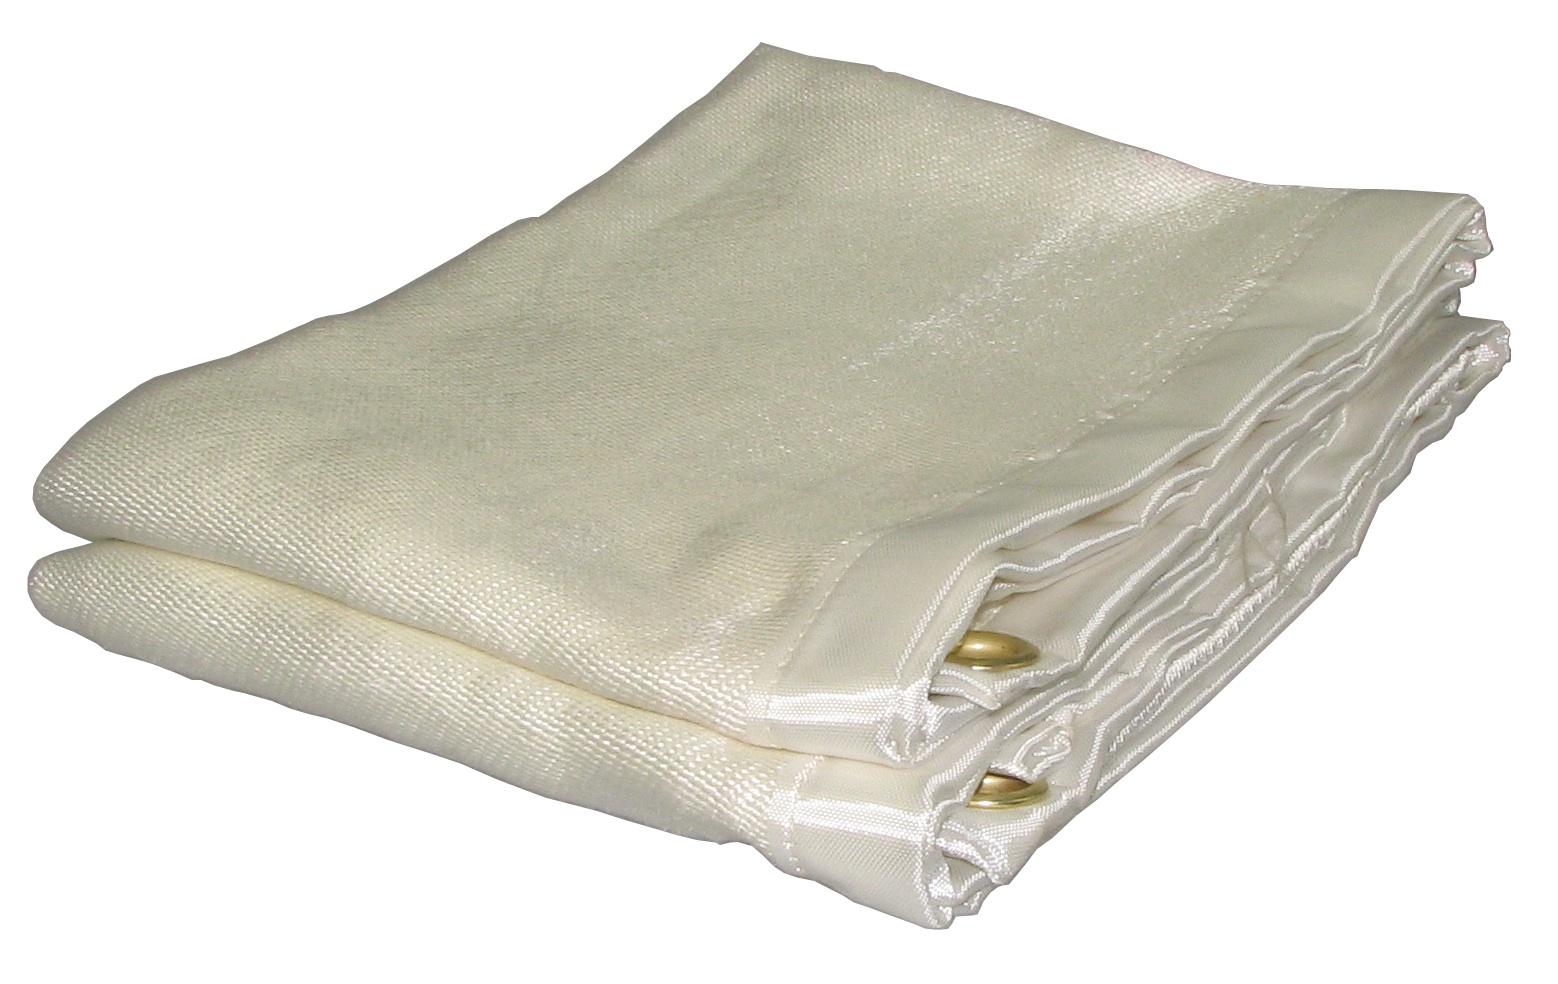 Welding Blankets & Curtains